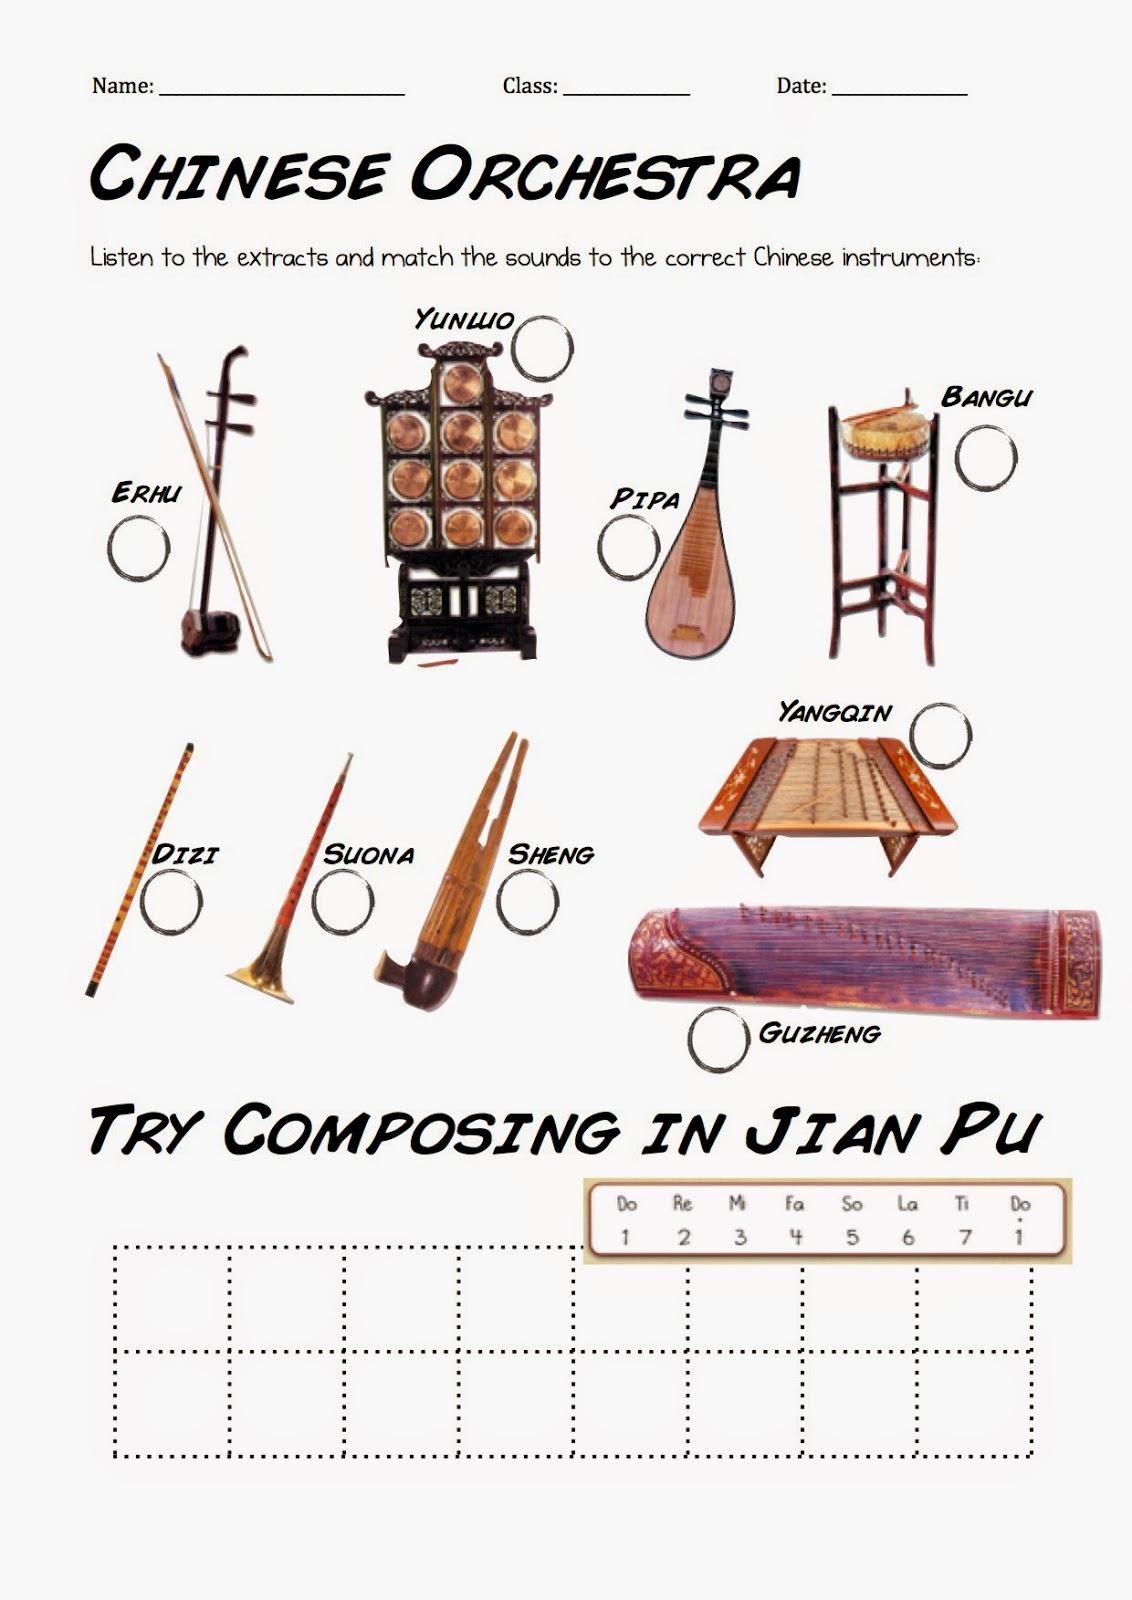 Primary School Music Lesson Ideas